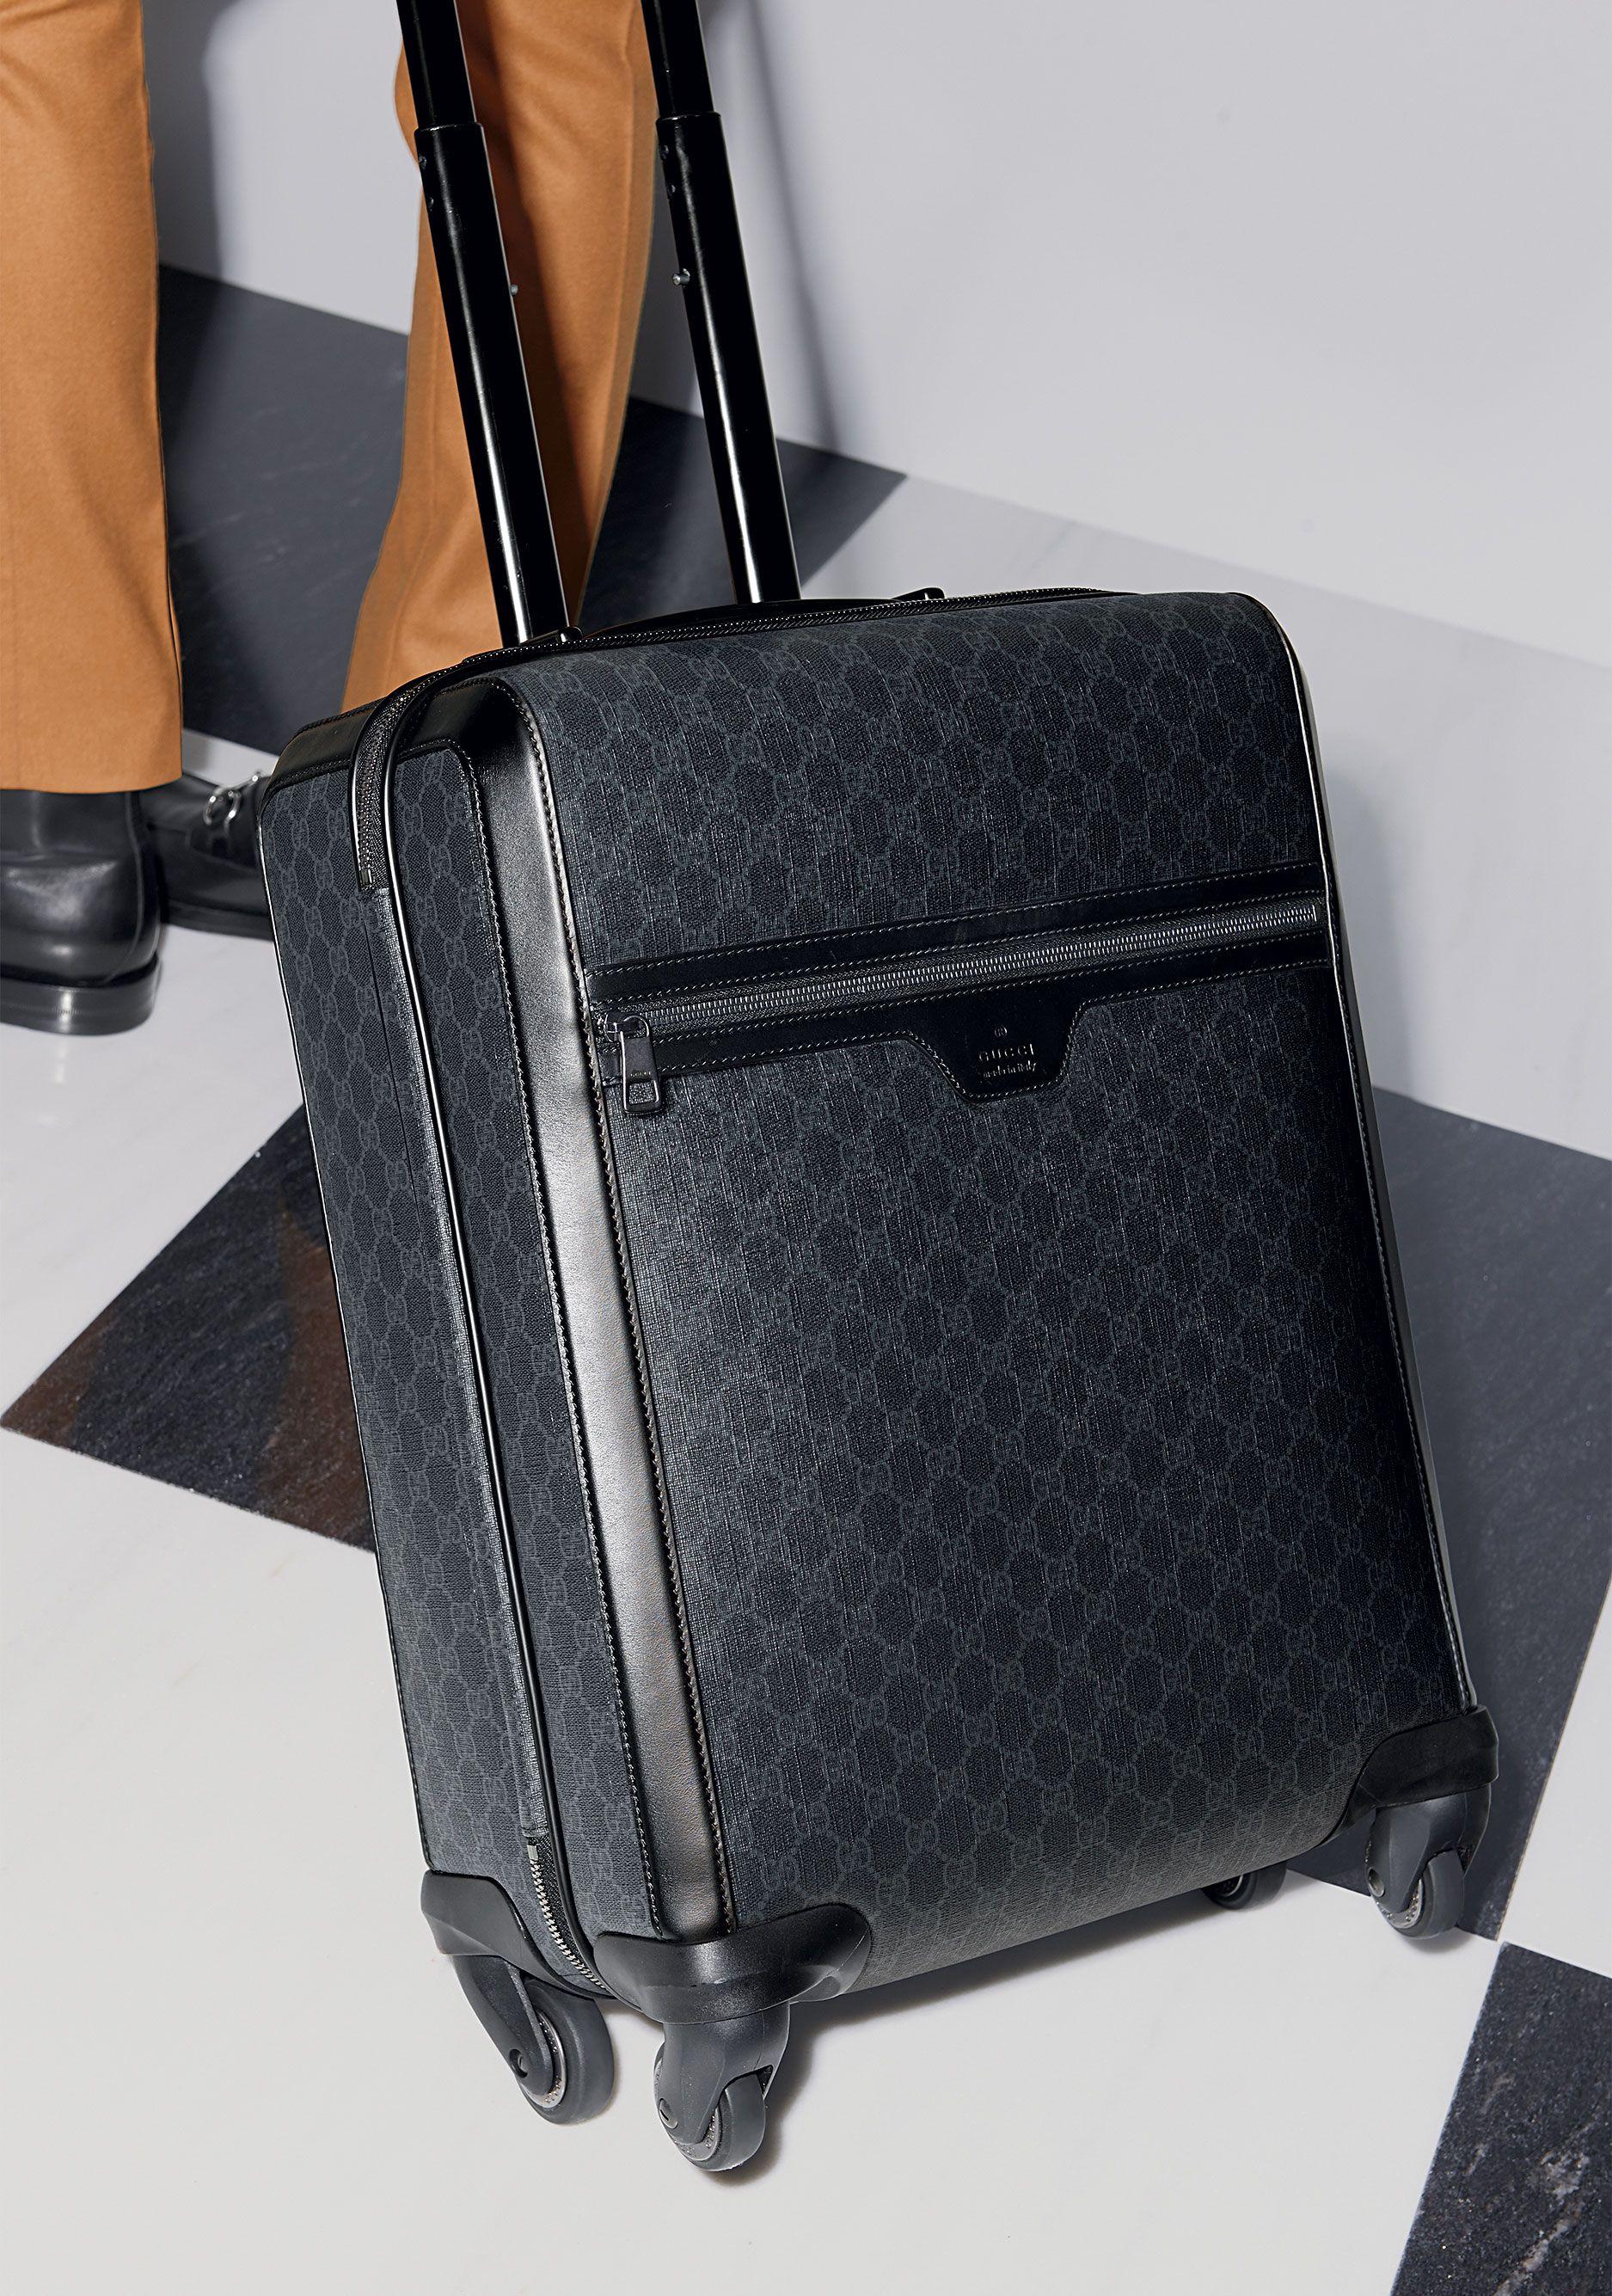 f3097e6ae91 Gucci Pre-Fall 2014  GG Supreme Canvas Wheeled Carry-On Suitcase.....LOVE  IT!!!